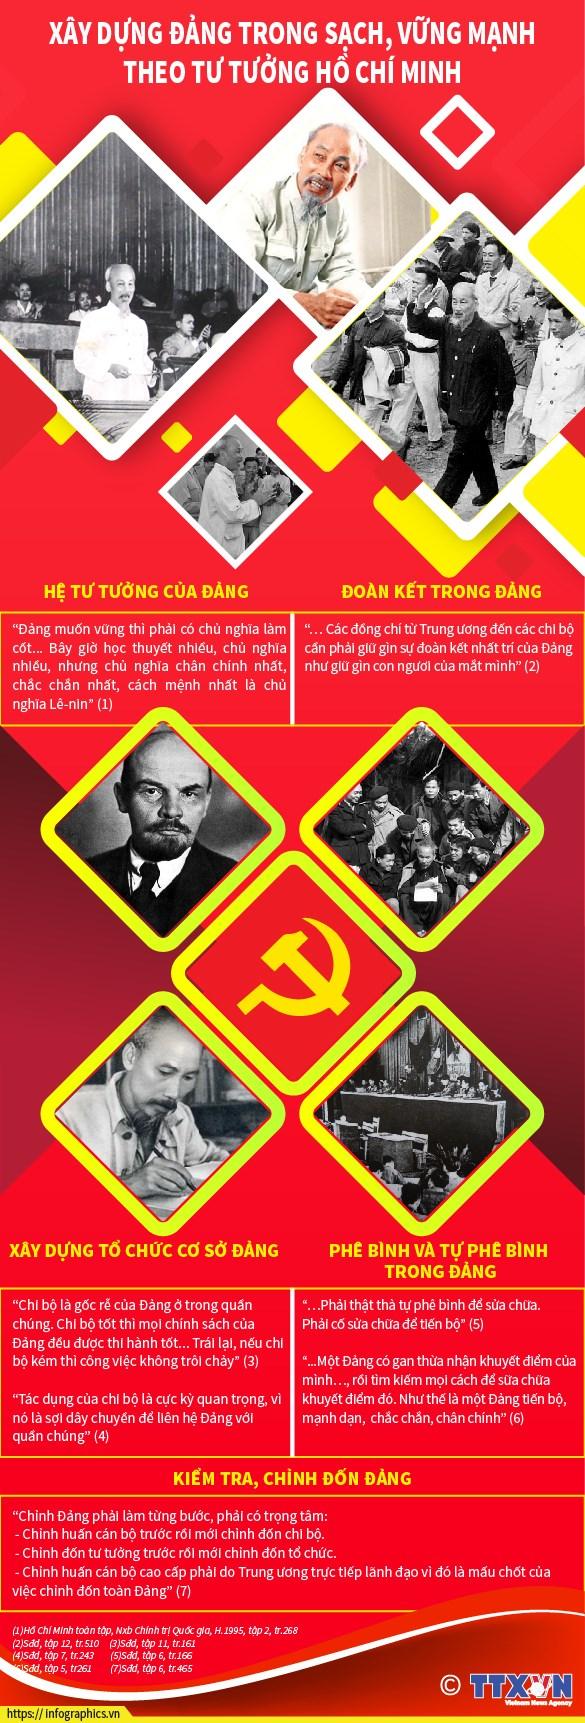 [Infographics] Xay dung Dang trong sach theo tu tuong Ho Chi Minh hinh anh 1